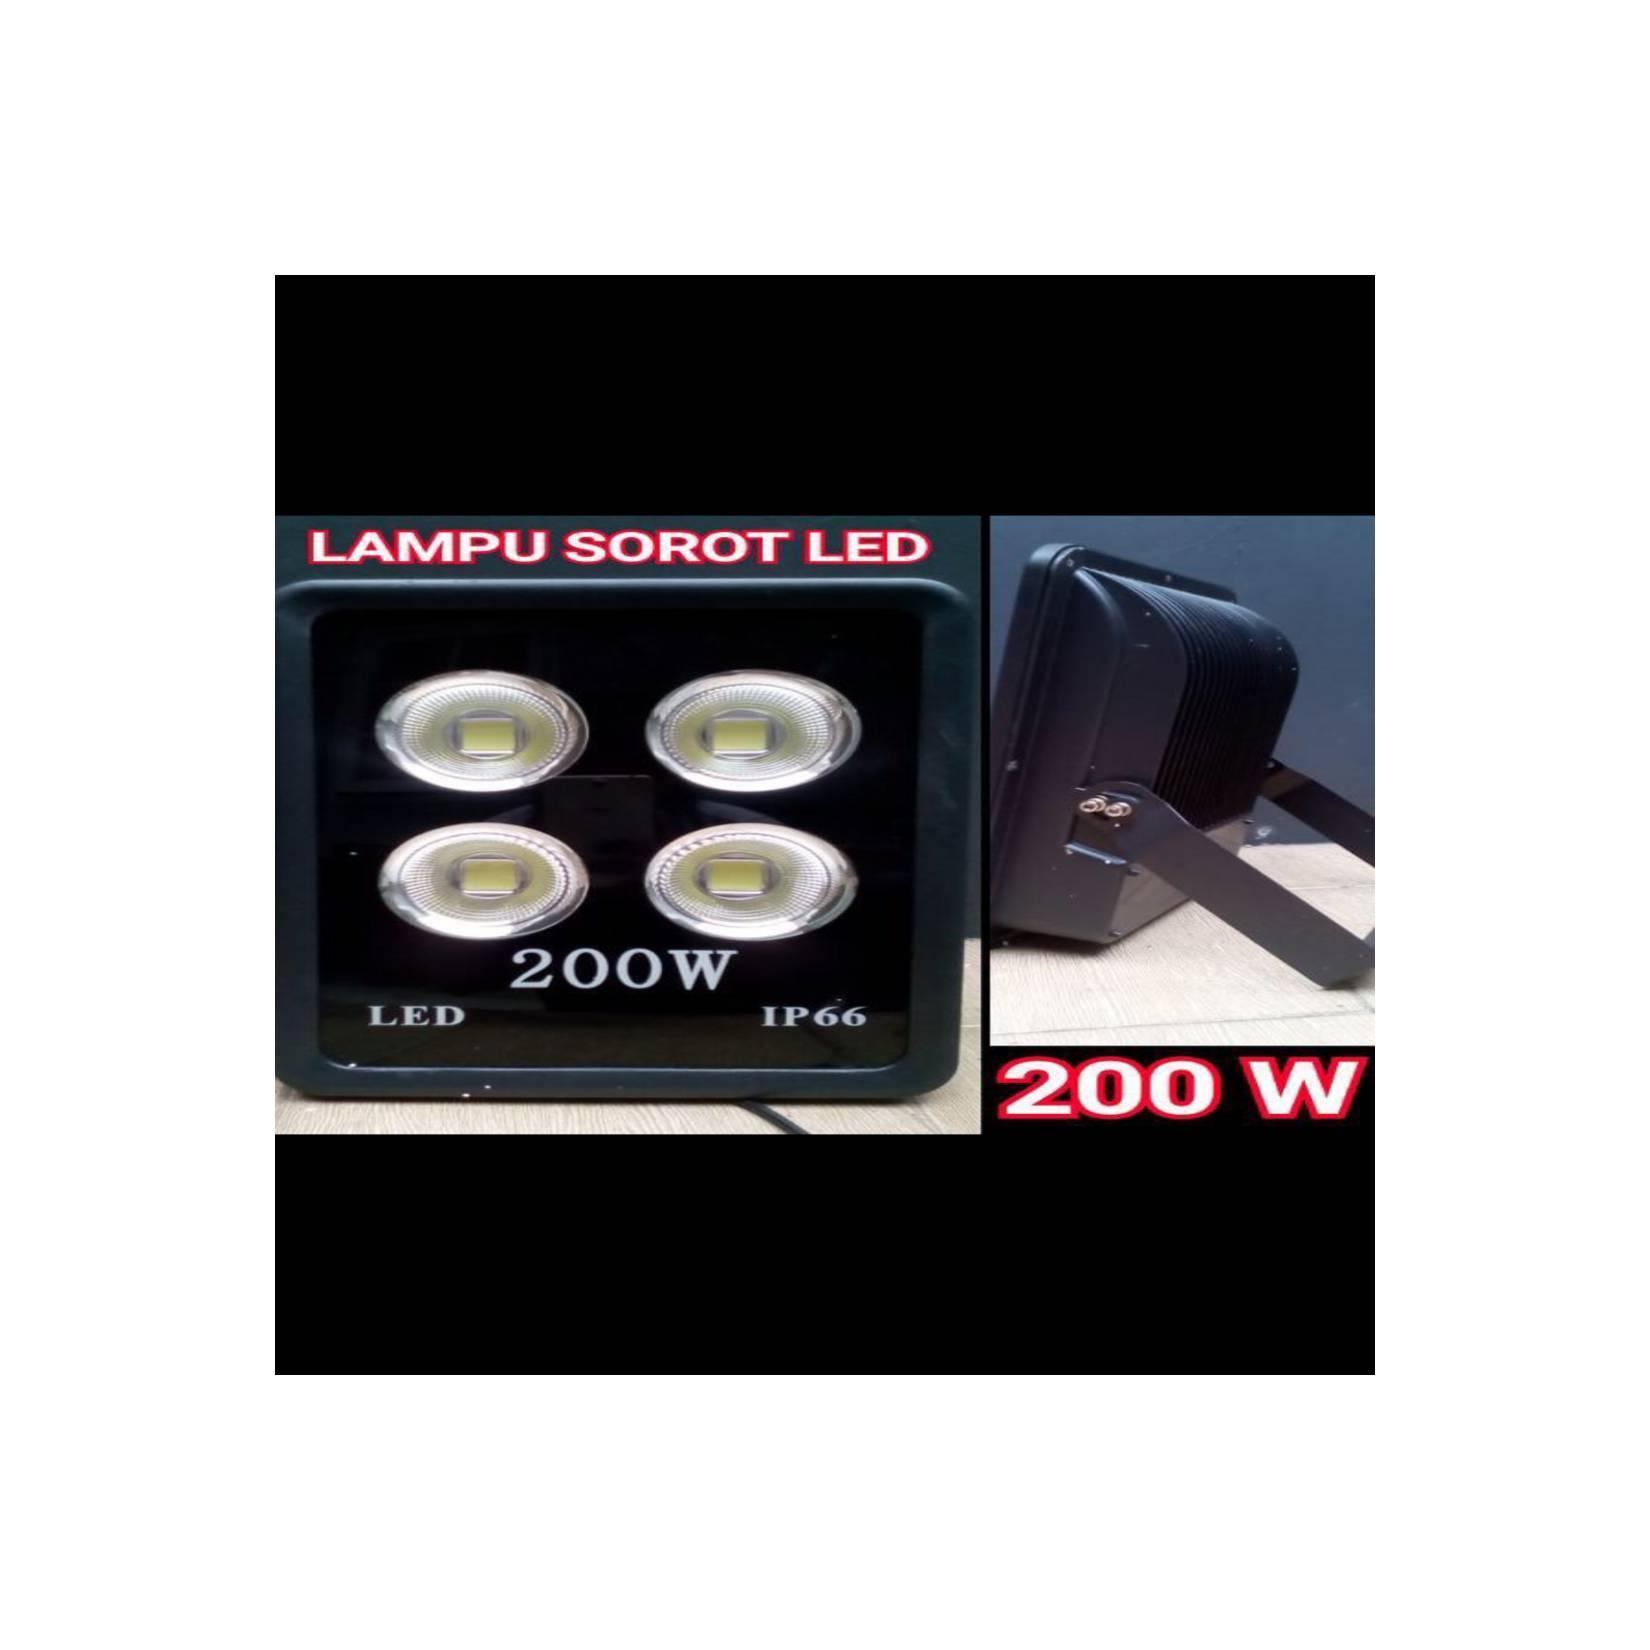 lampu sorot led / lampu tembak / floodlight led 200w 200watt lensa cob